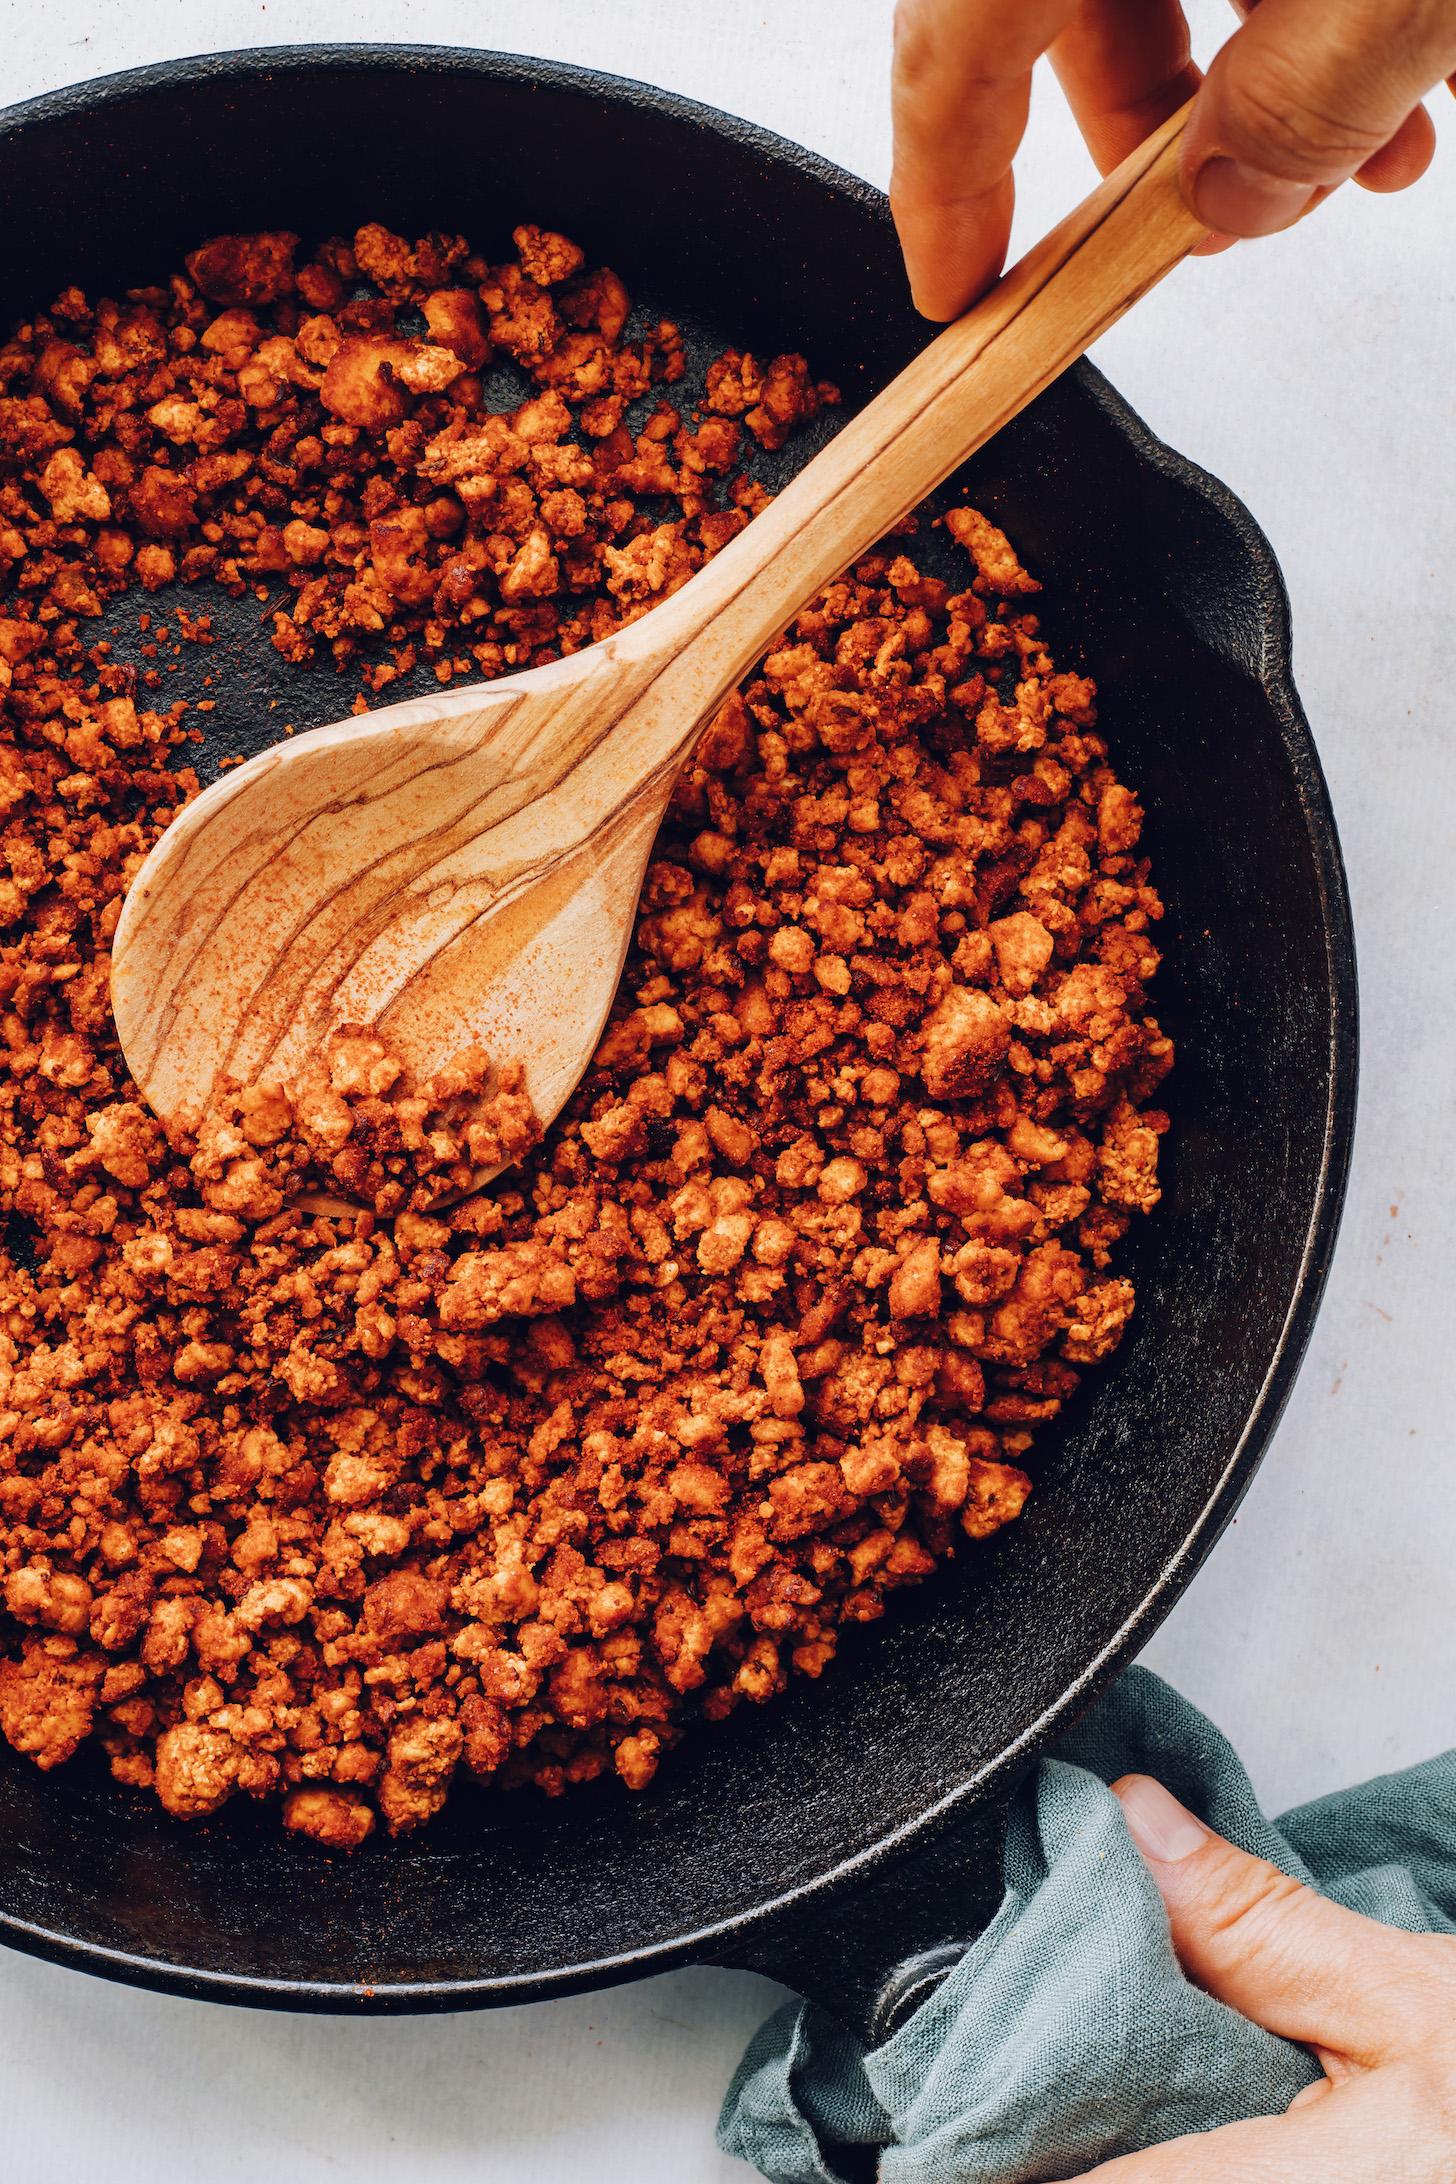 Cooking vegan chorizo in a skillet